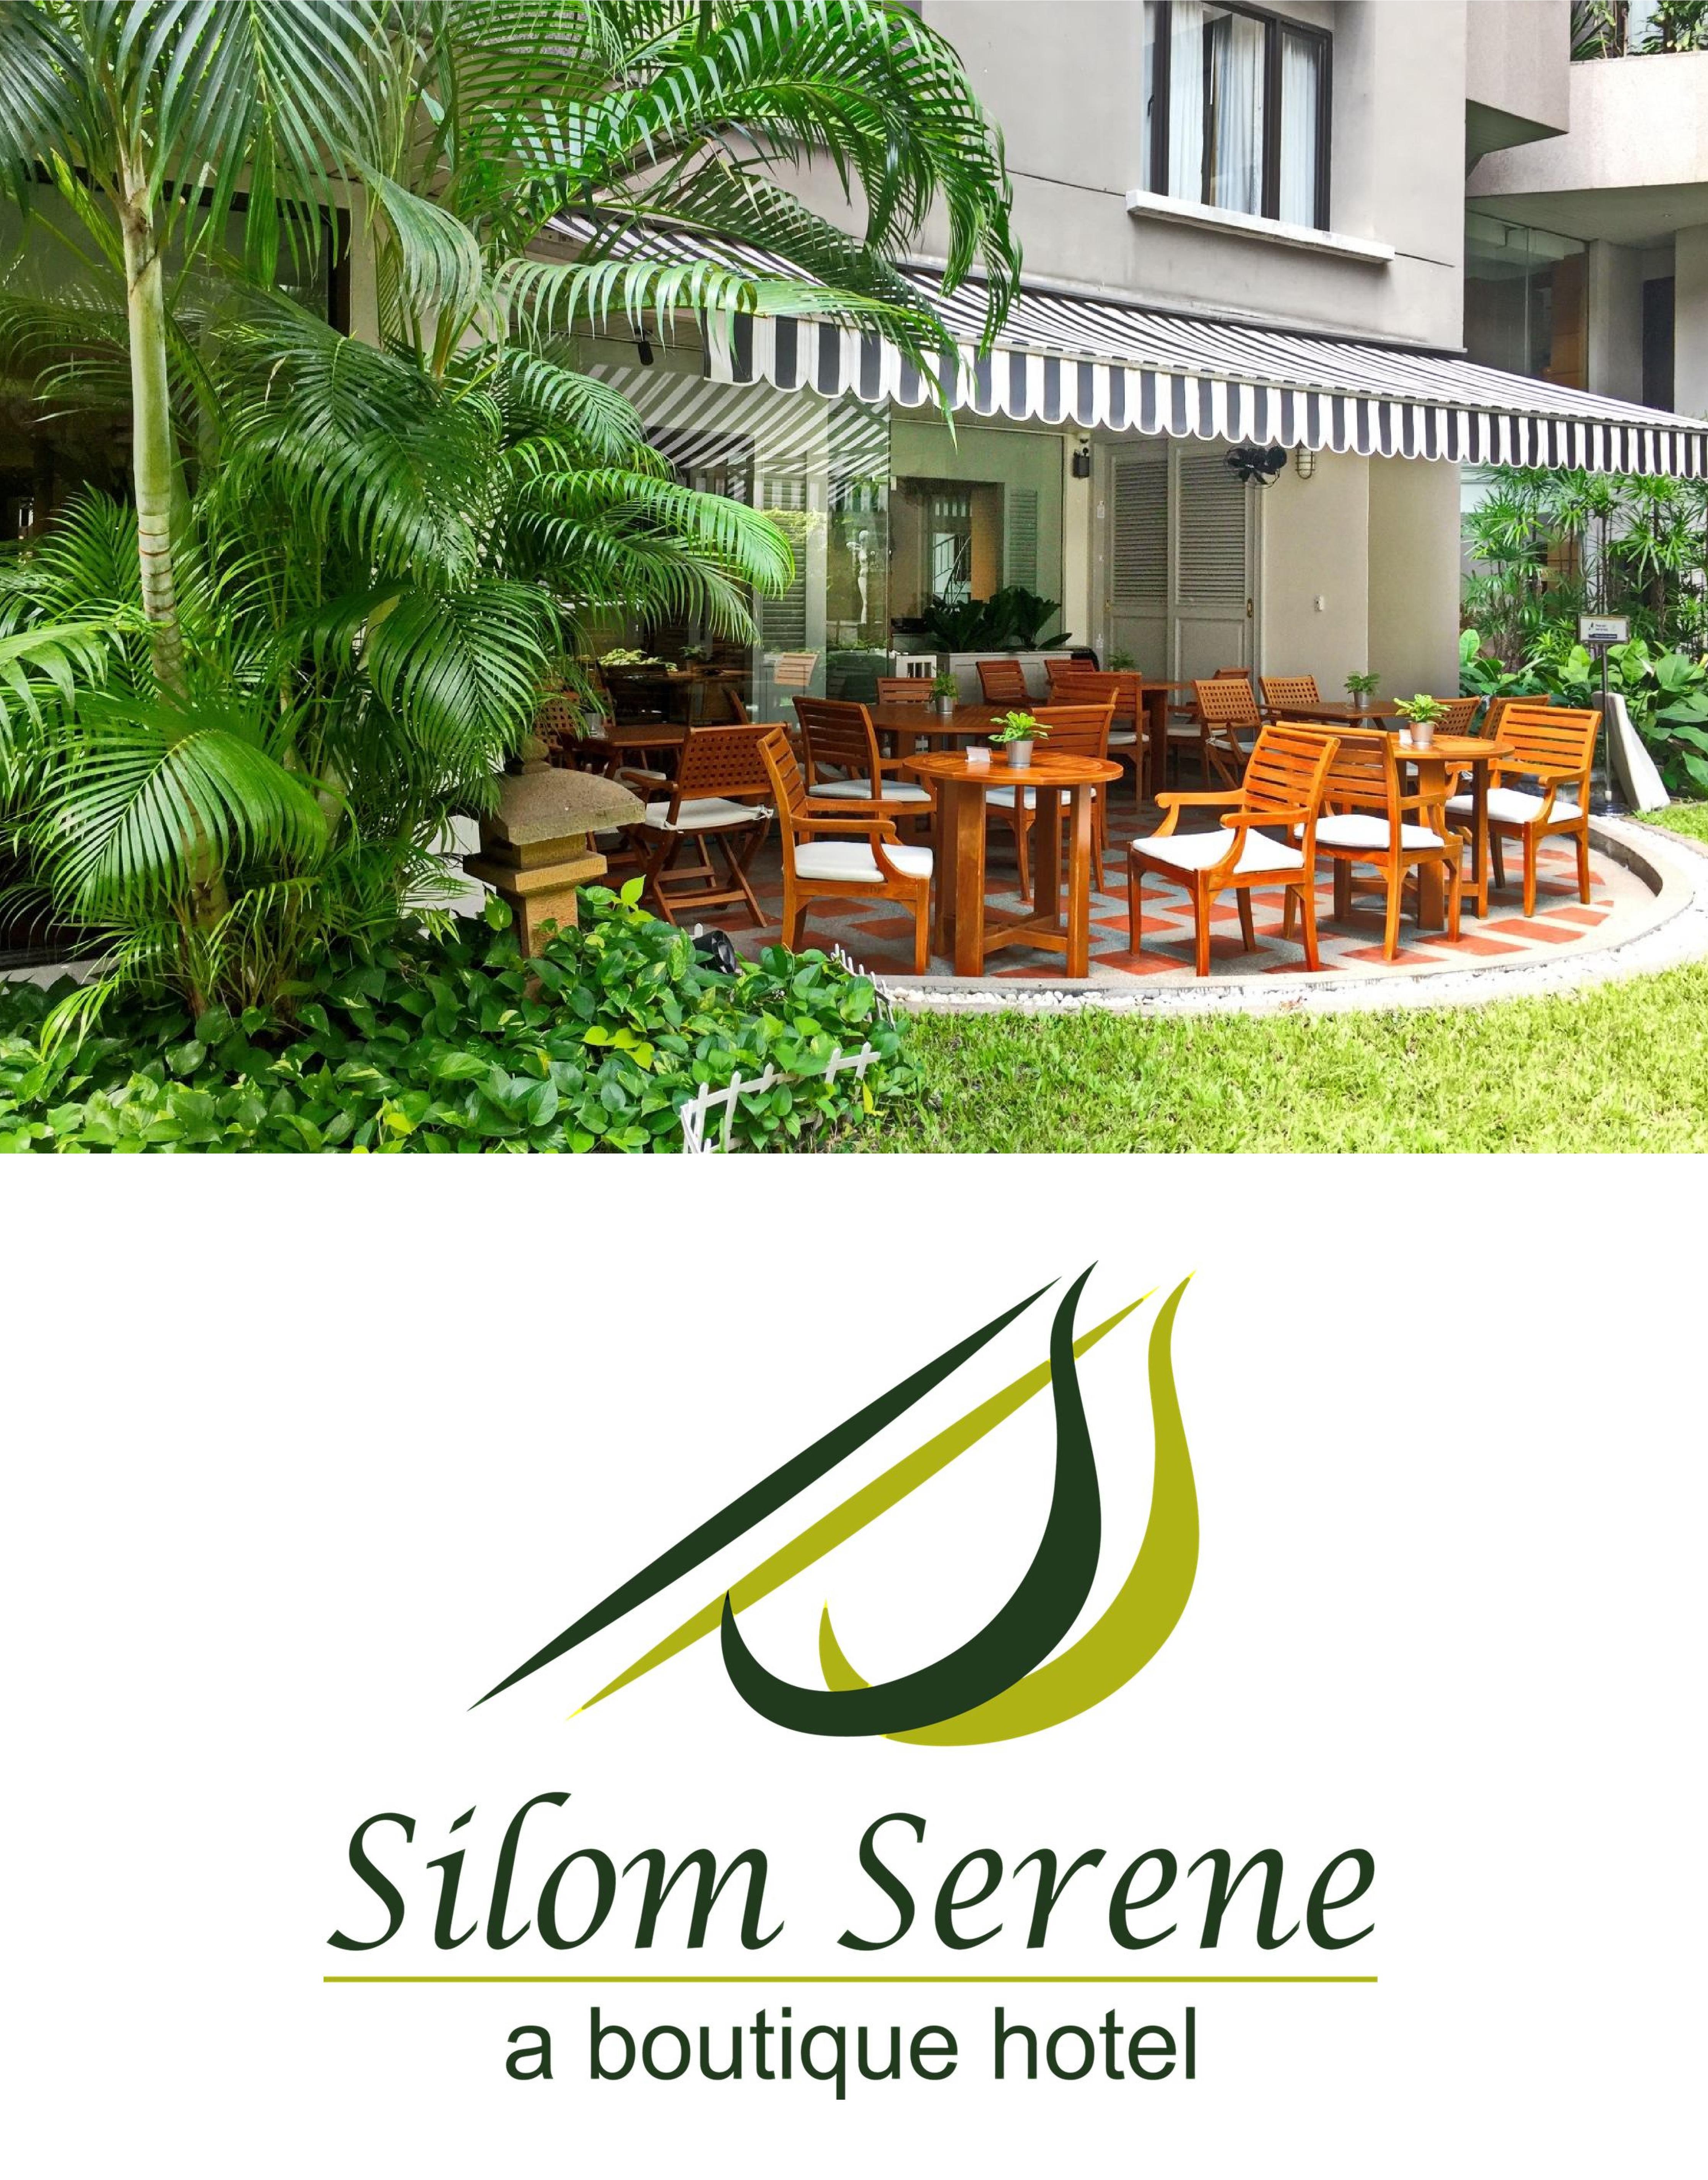 Silom Serene Boutique Hotel, Bangkok, Thailand